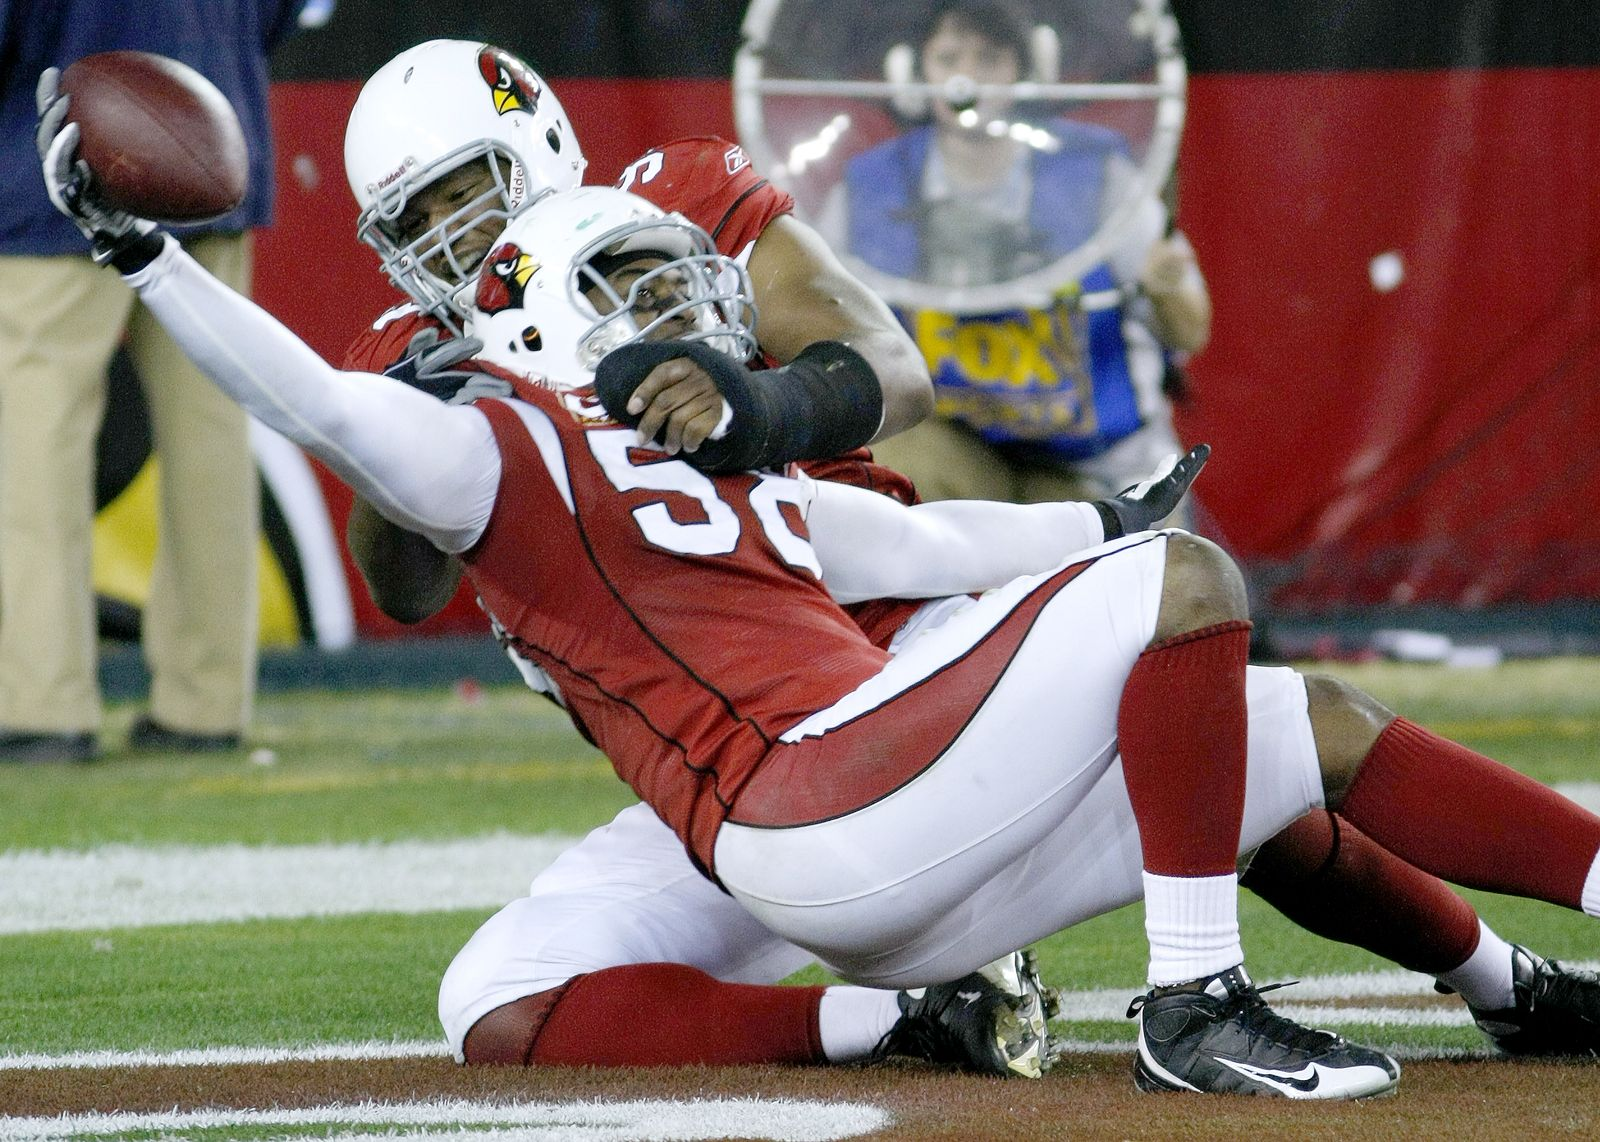 Karlos Dansby / Arizona Cardinals